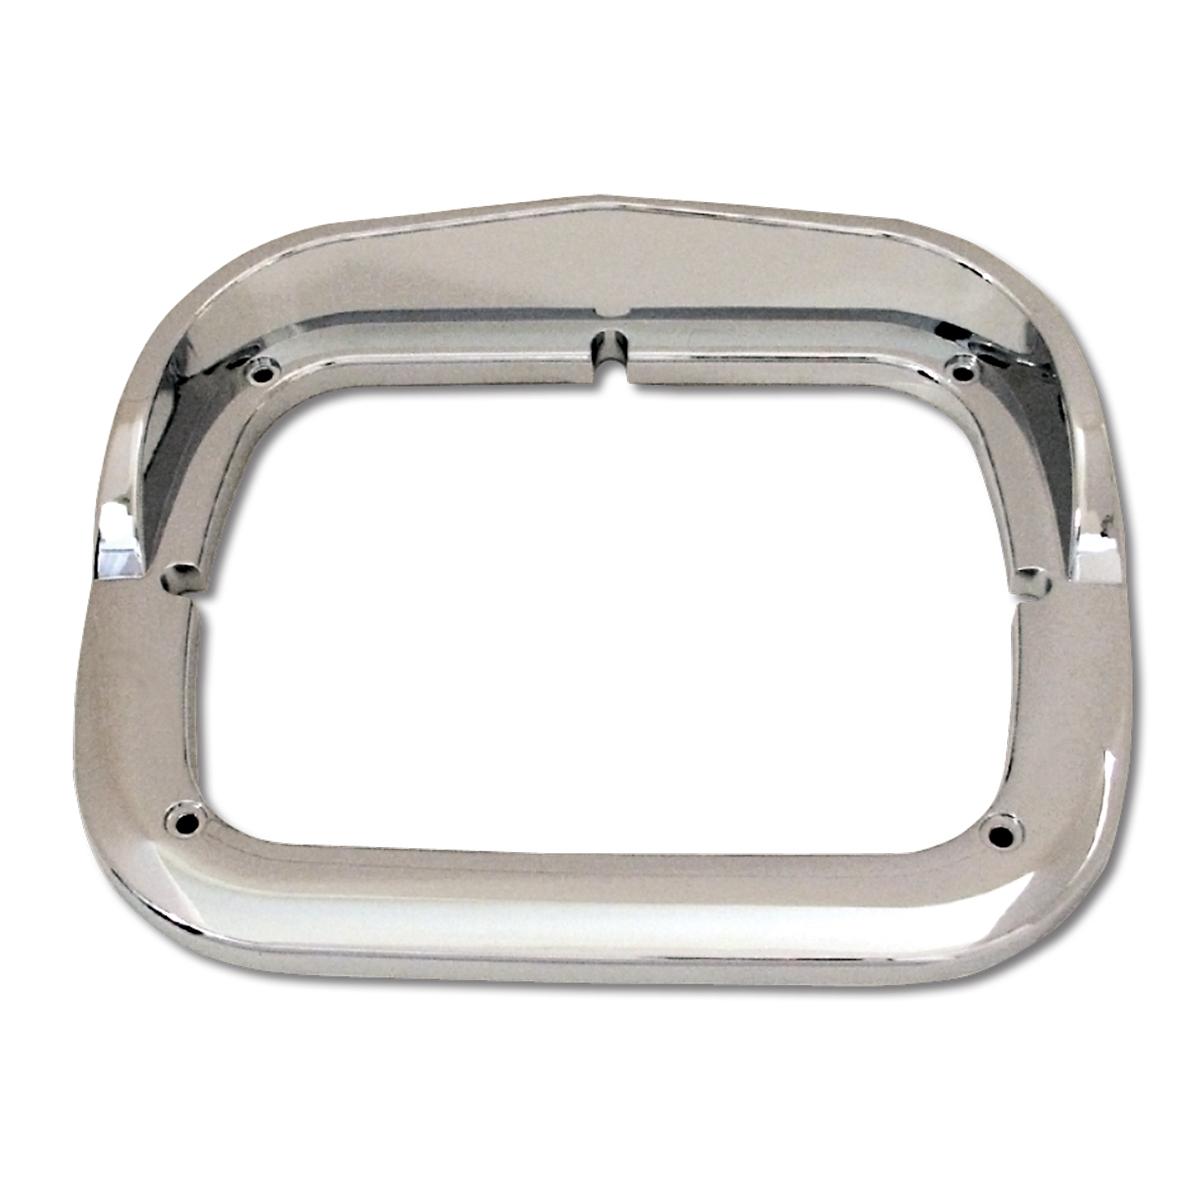 87594 Chrome Plastic Single Headlight Bezel